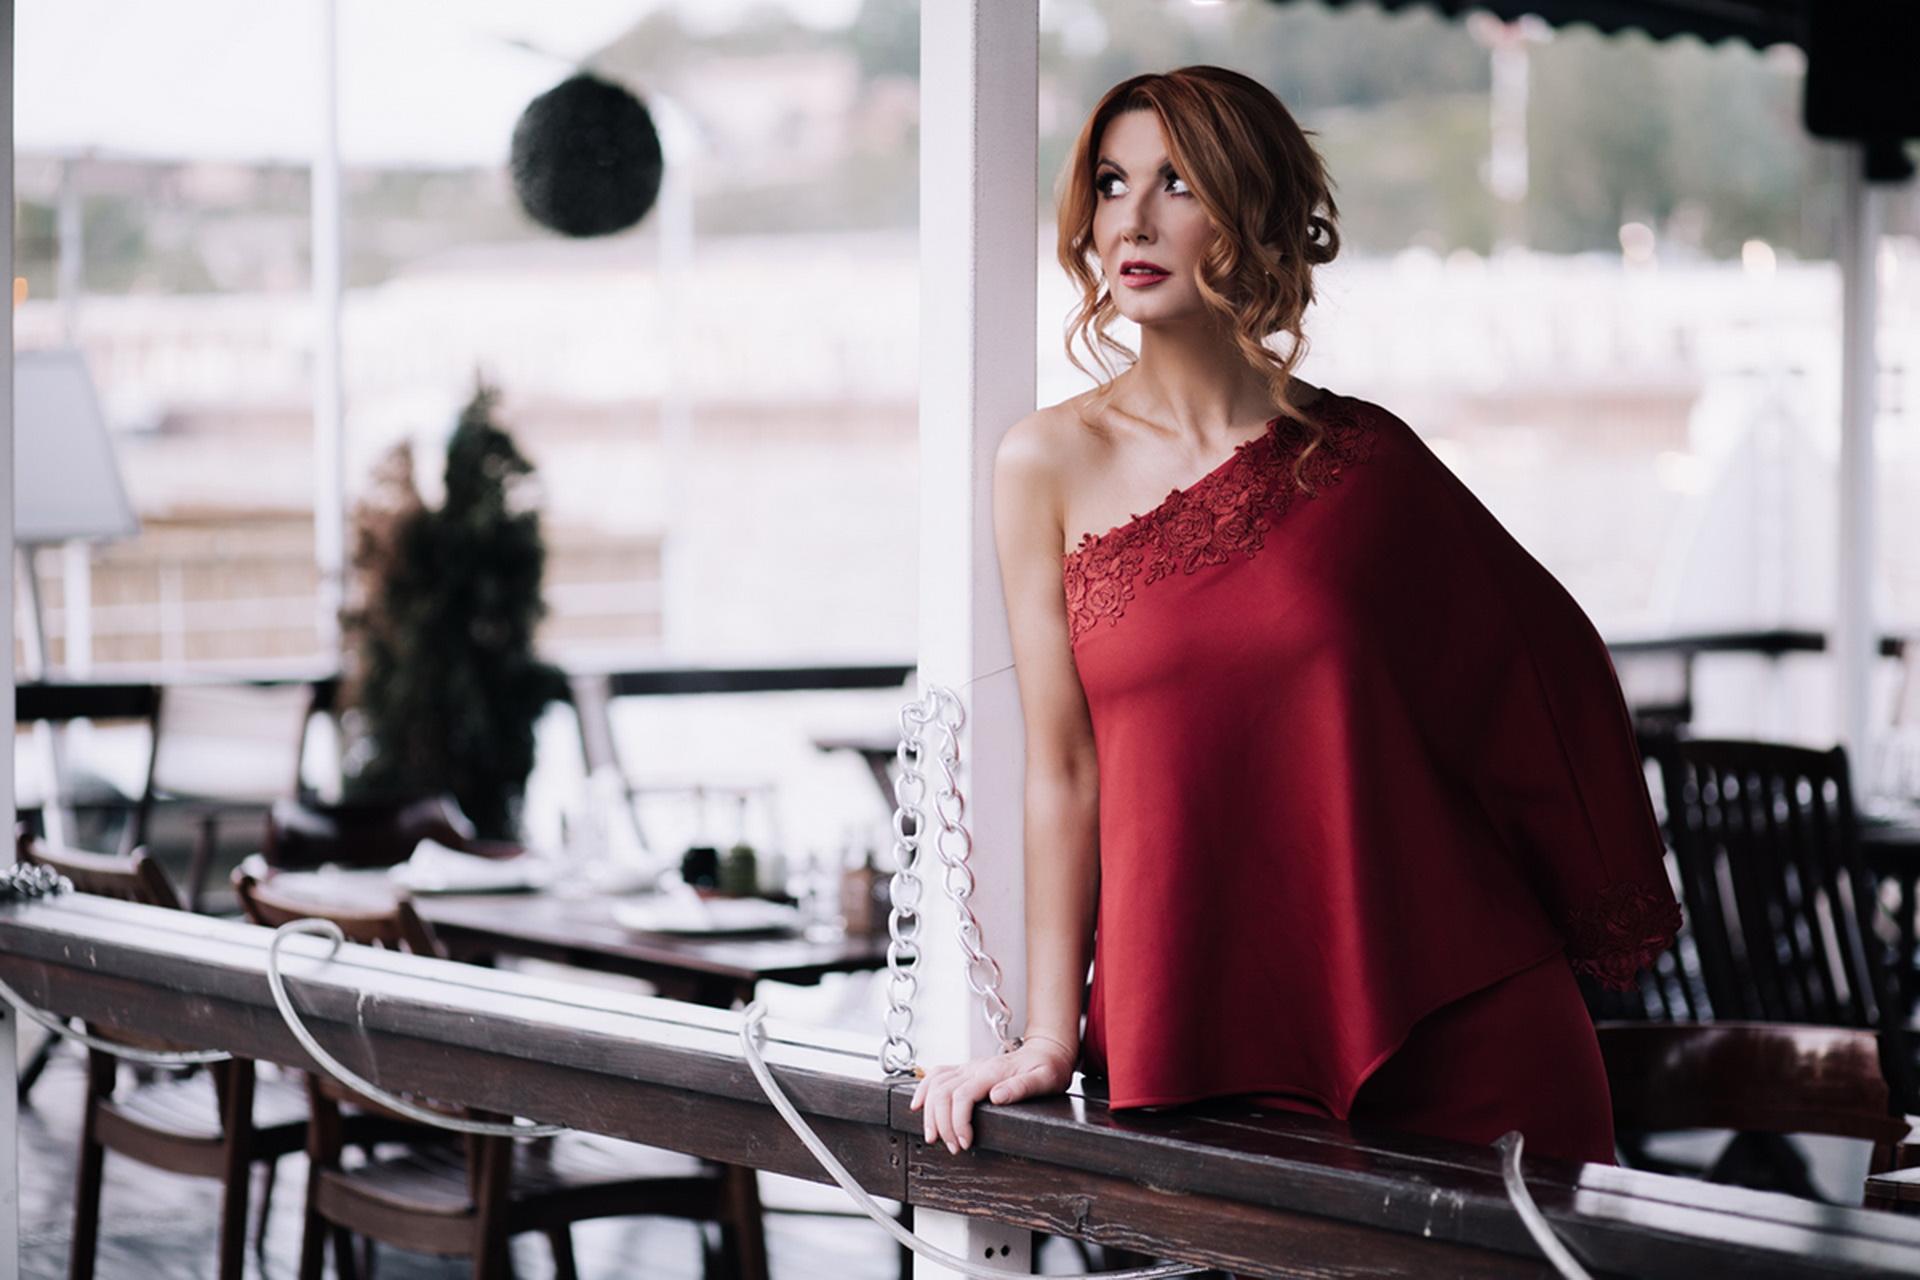 Vesna Dedic